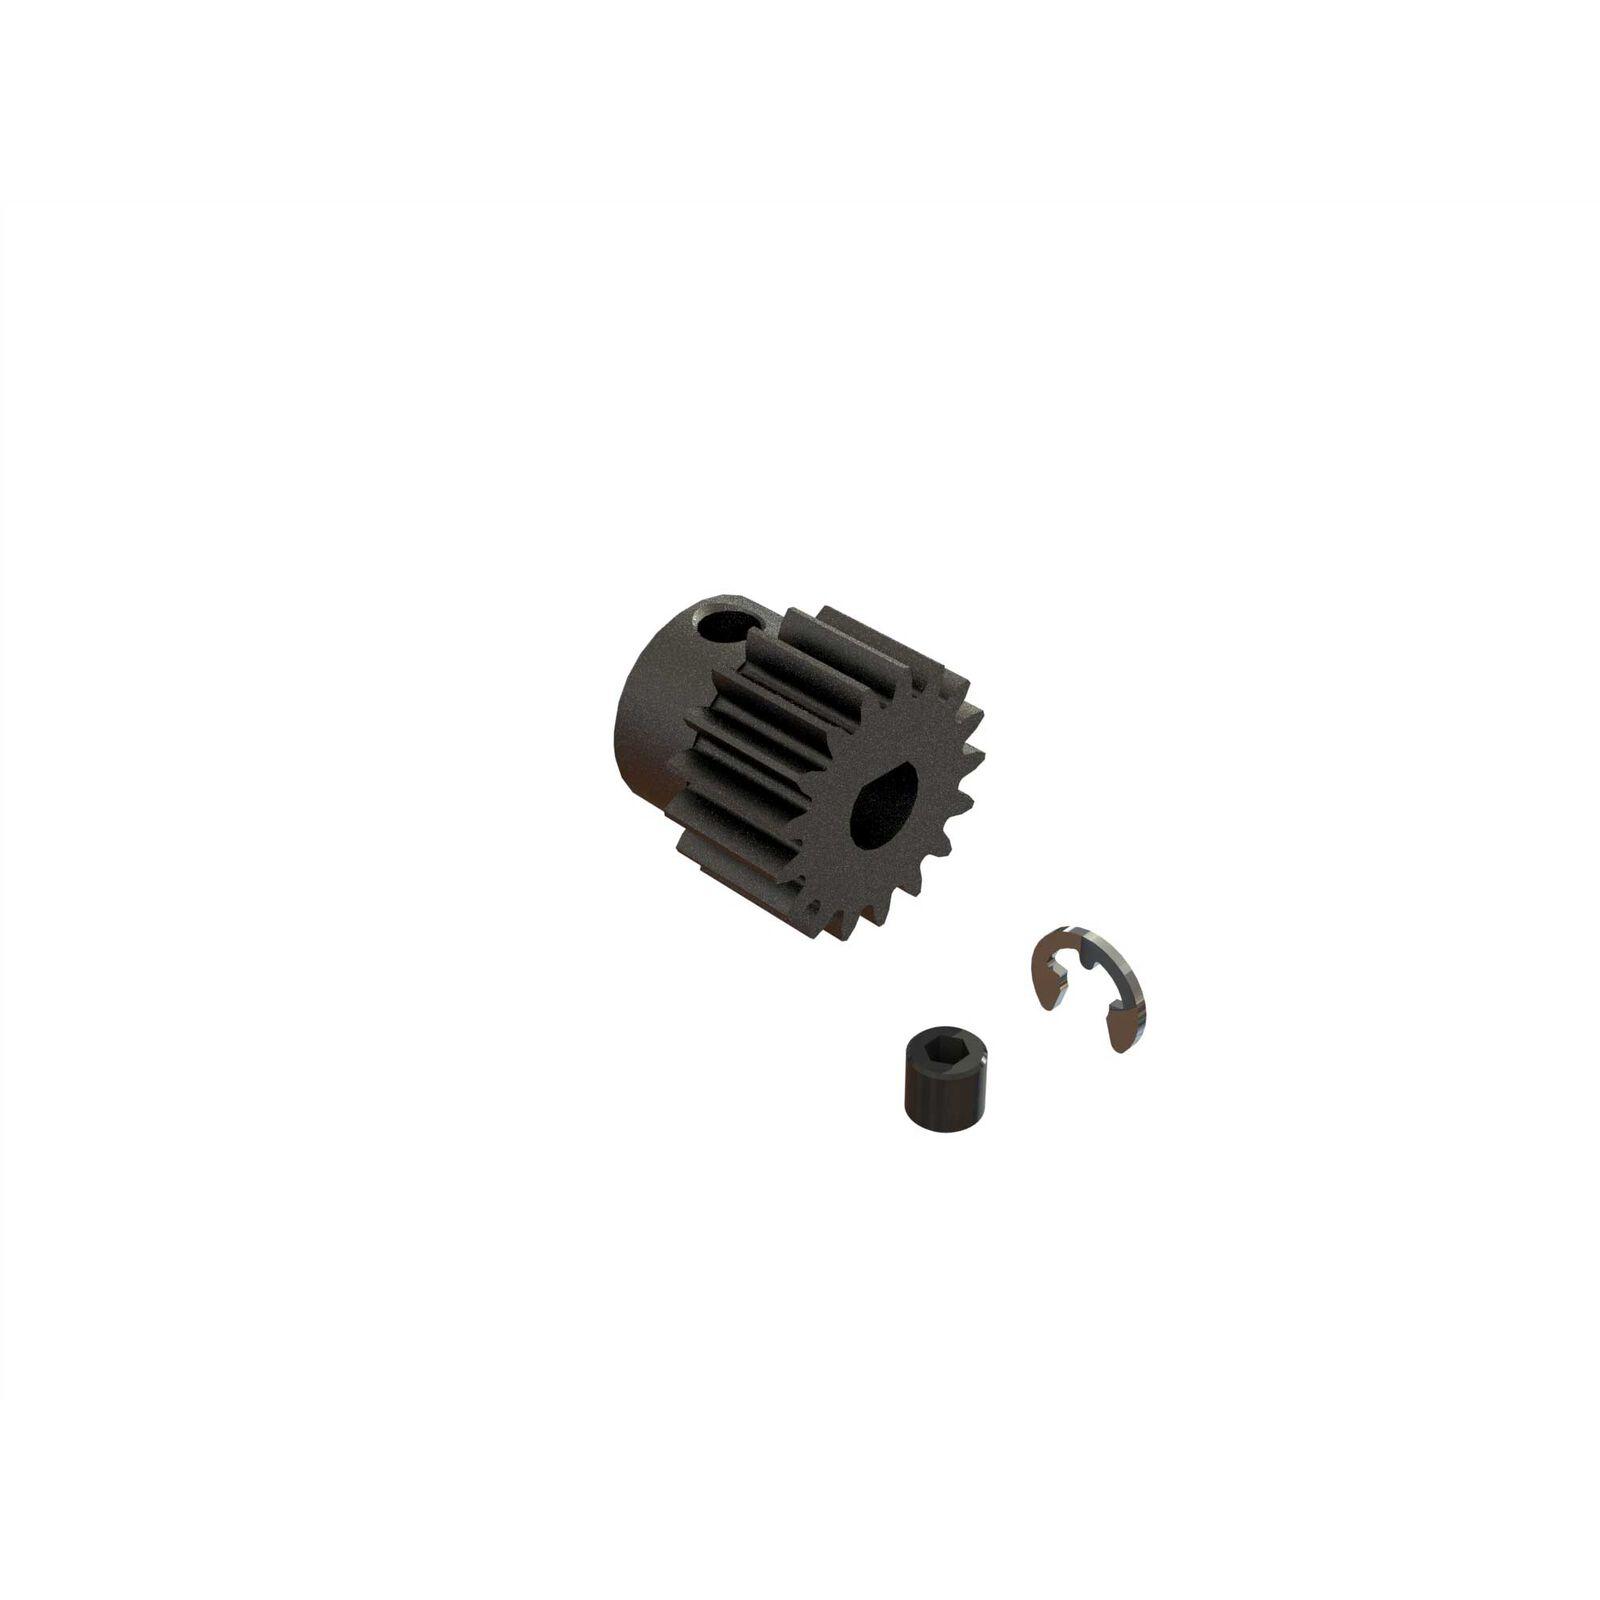 18T 0.8Mod Safe-D5 Pinion Gear